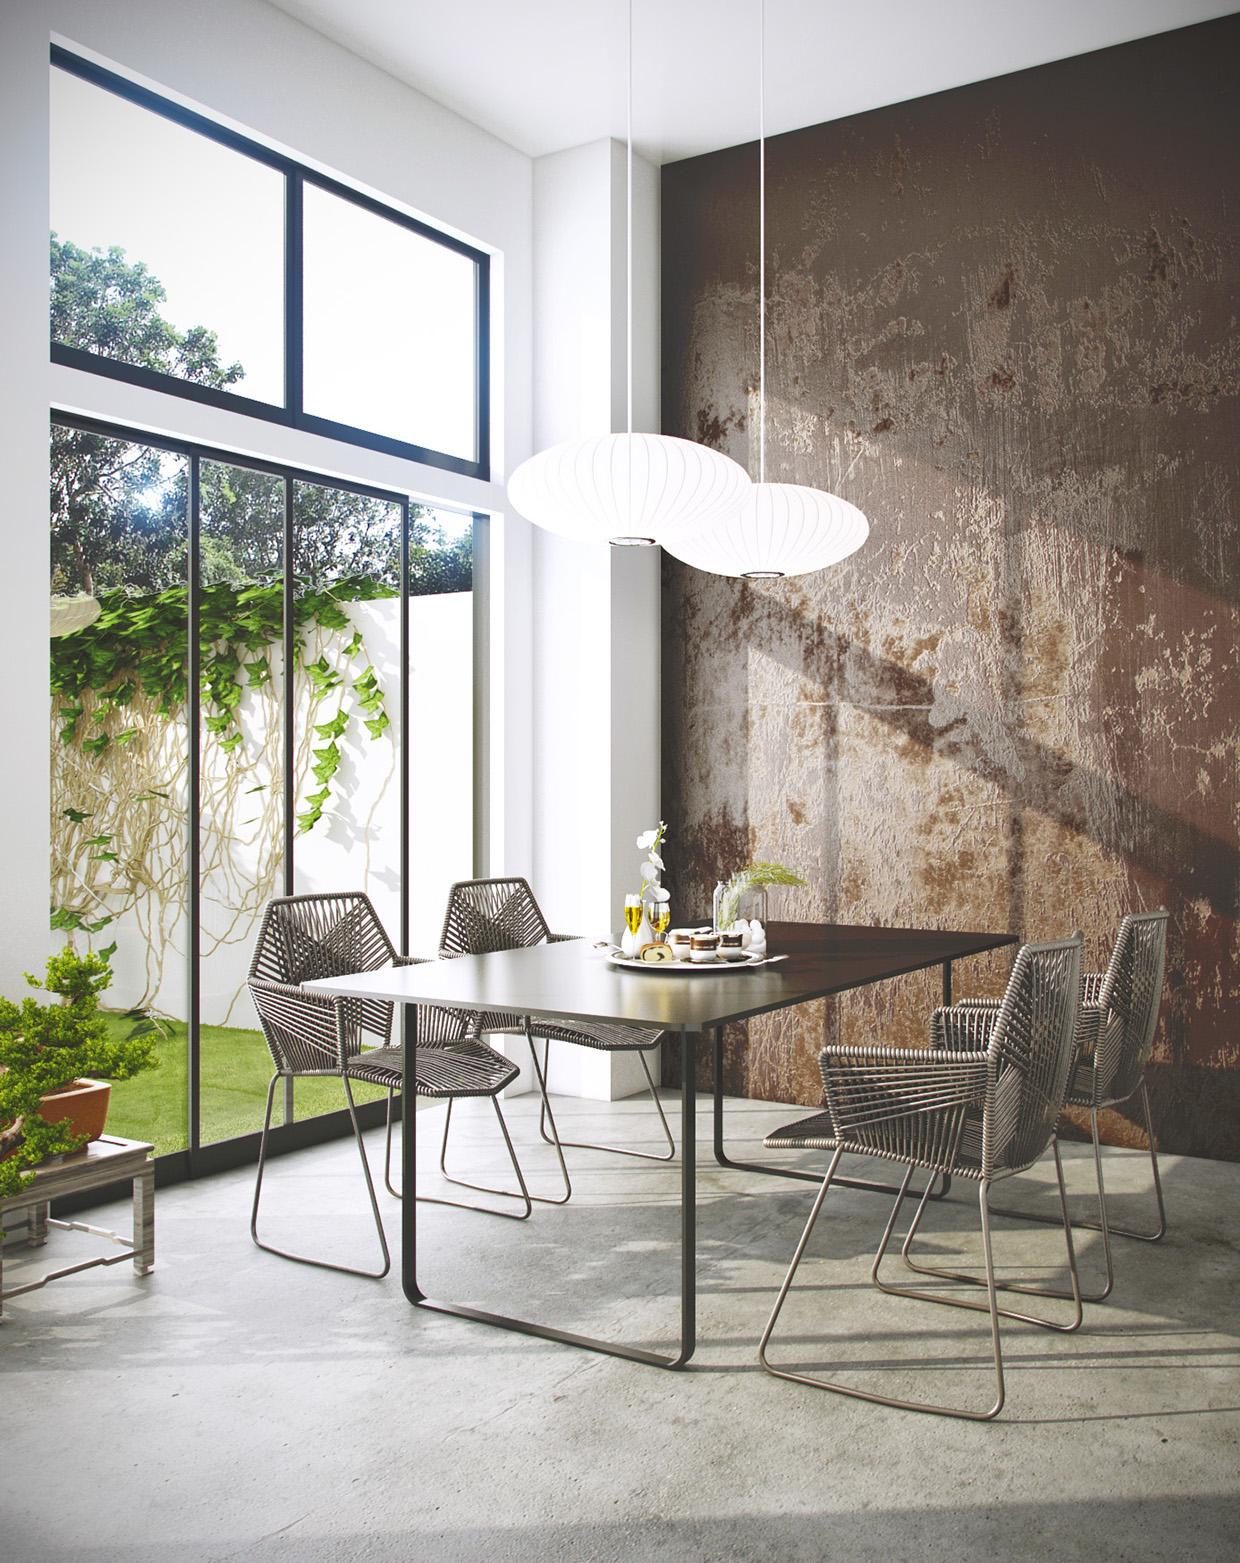 Modern Dining Room photo - 3